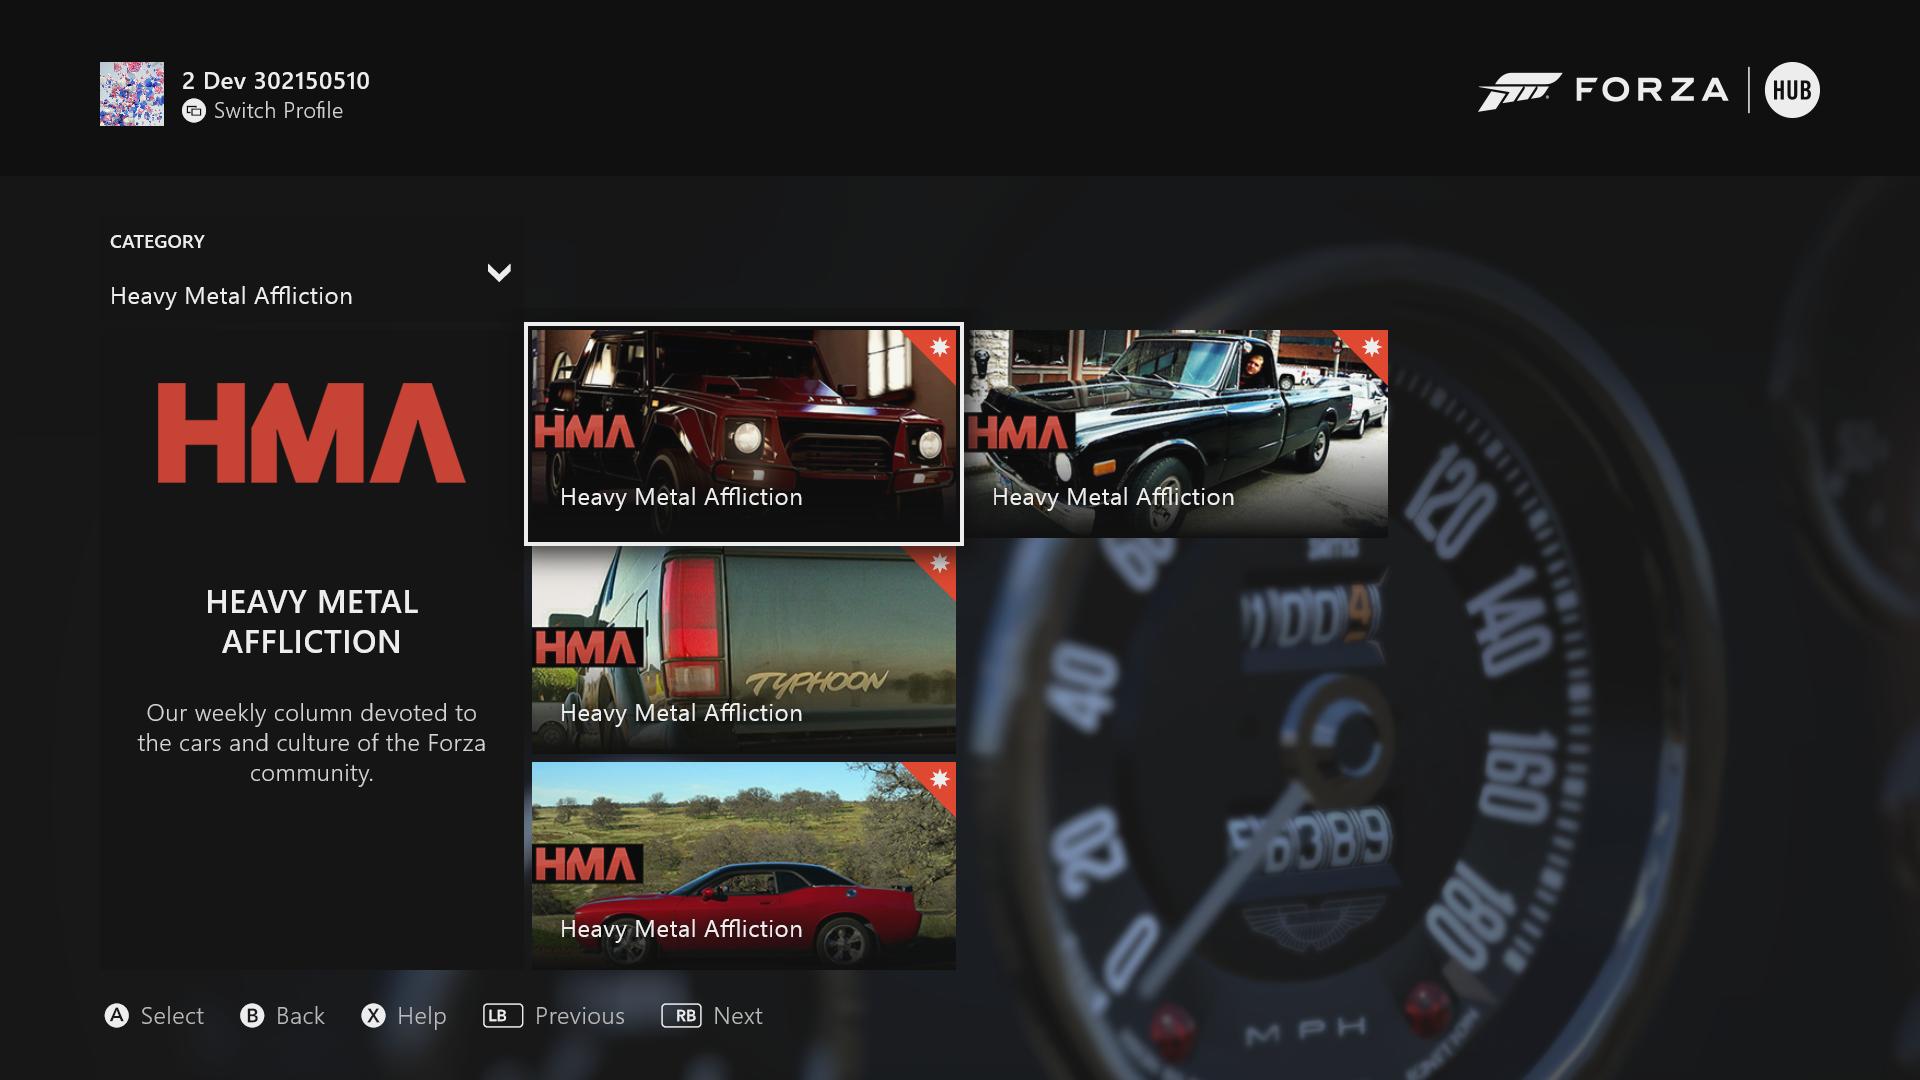 Forza Motorsport - Forza Hub - Update